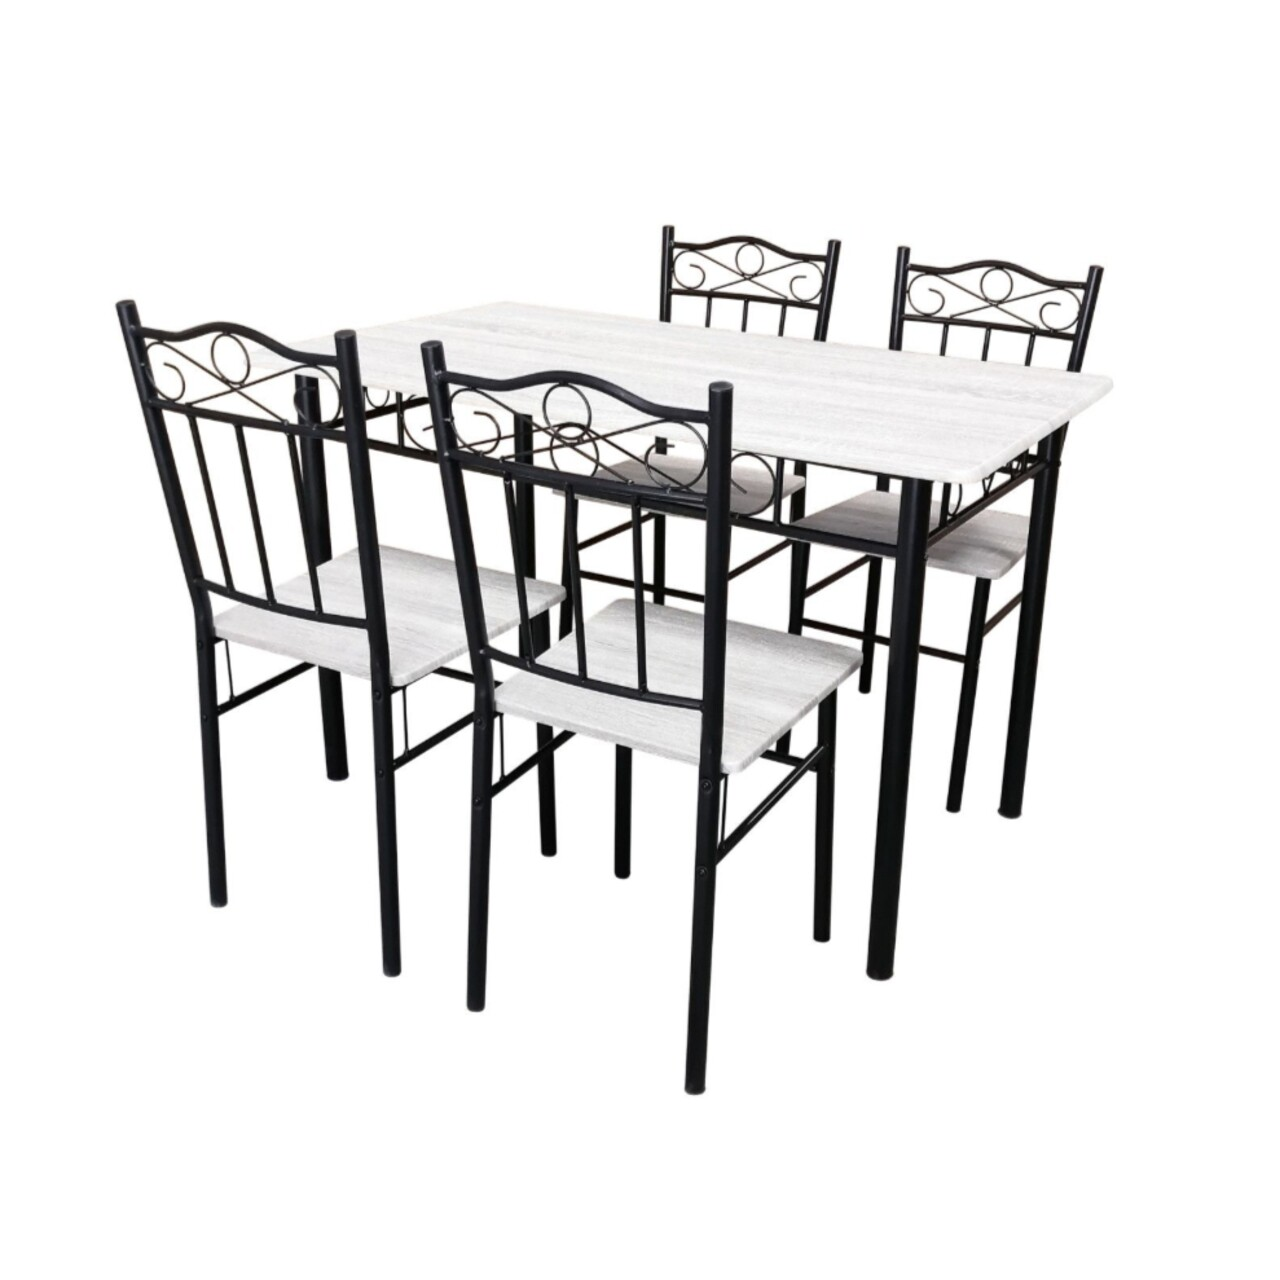 Set dining Bedora Asador, masa cu 4 scaune, Nuanta Mesteacan Alb